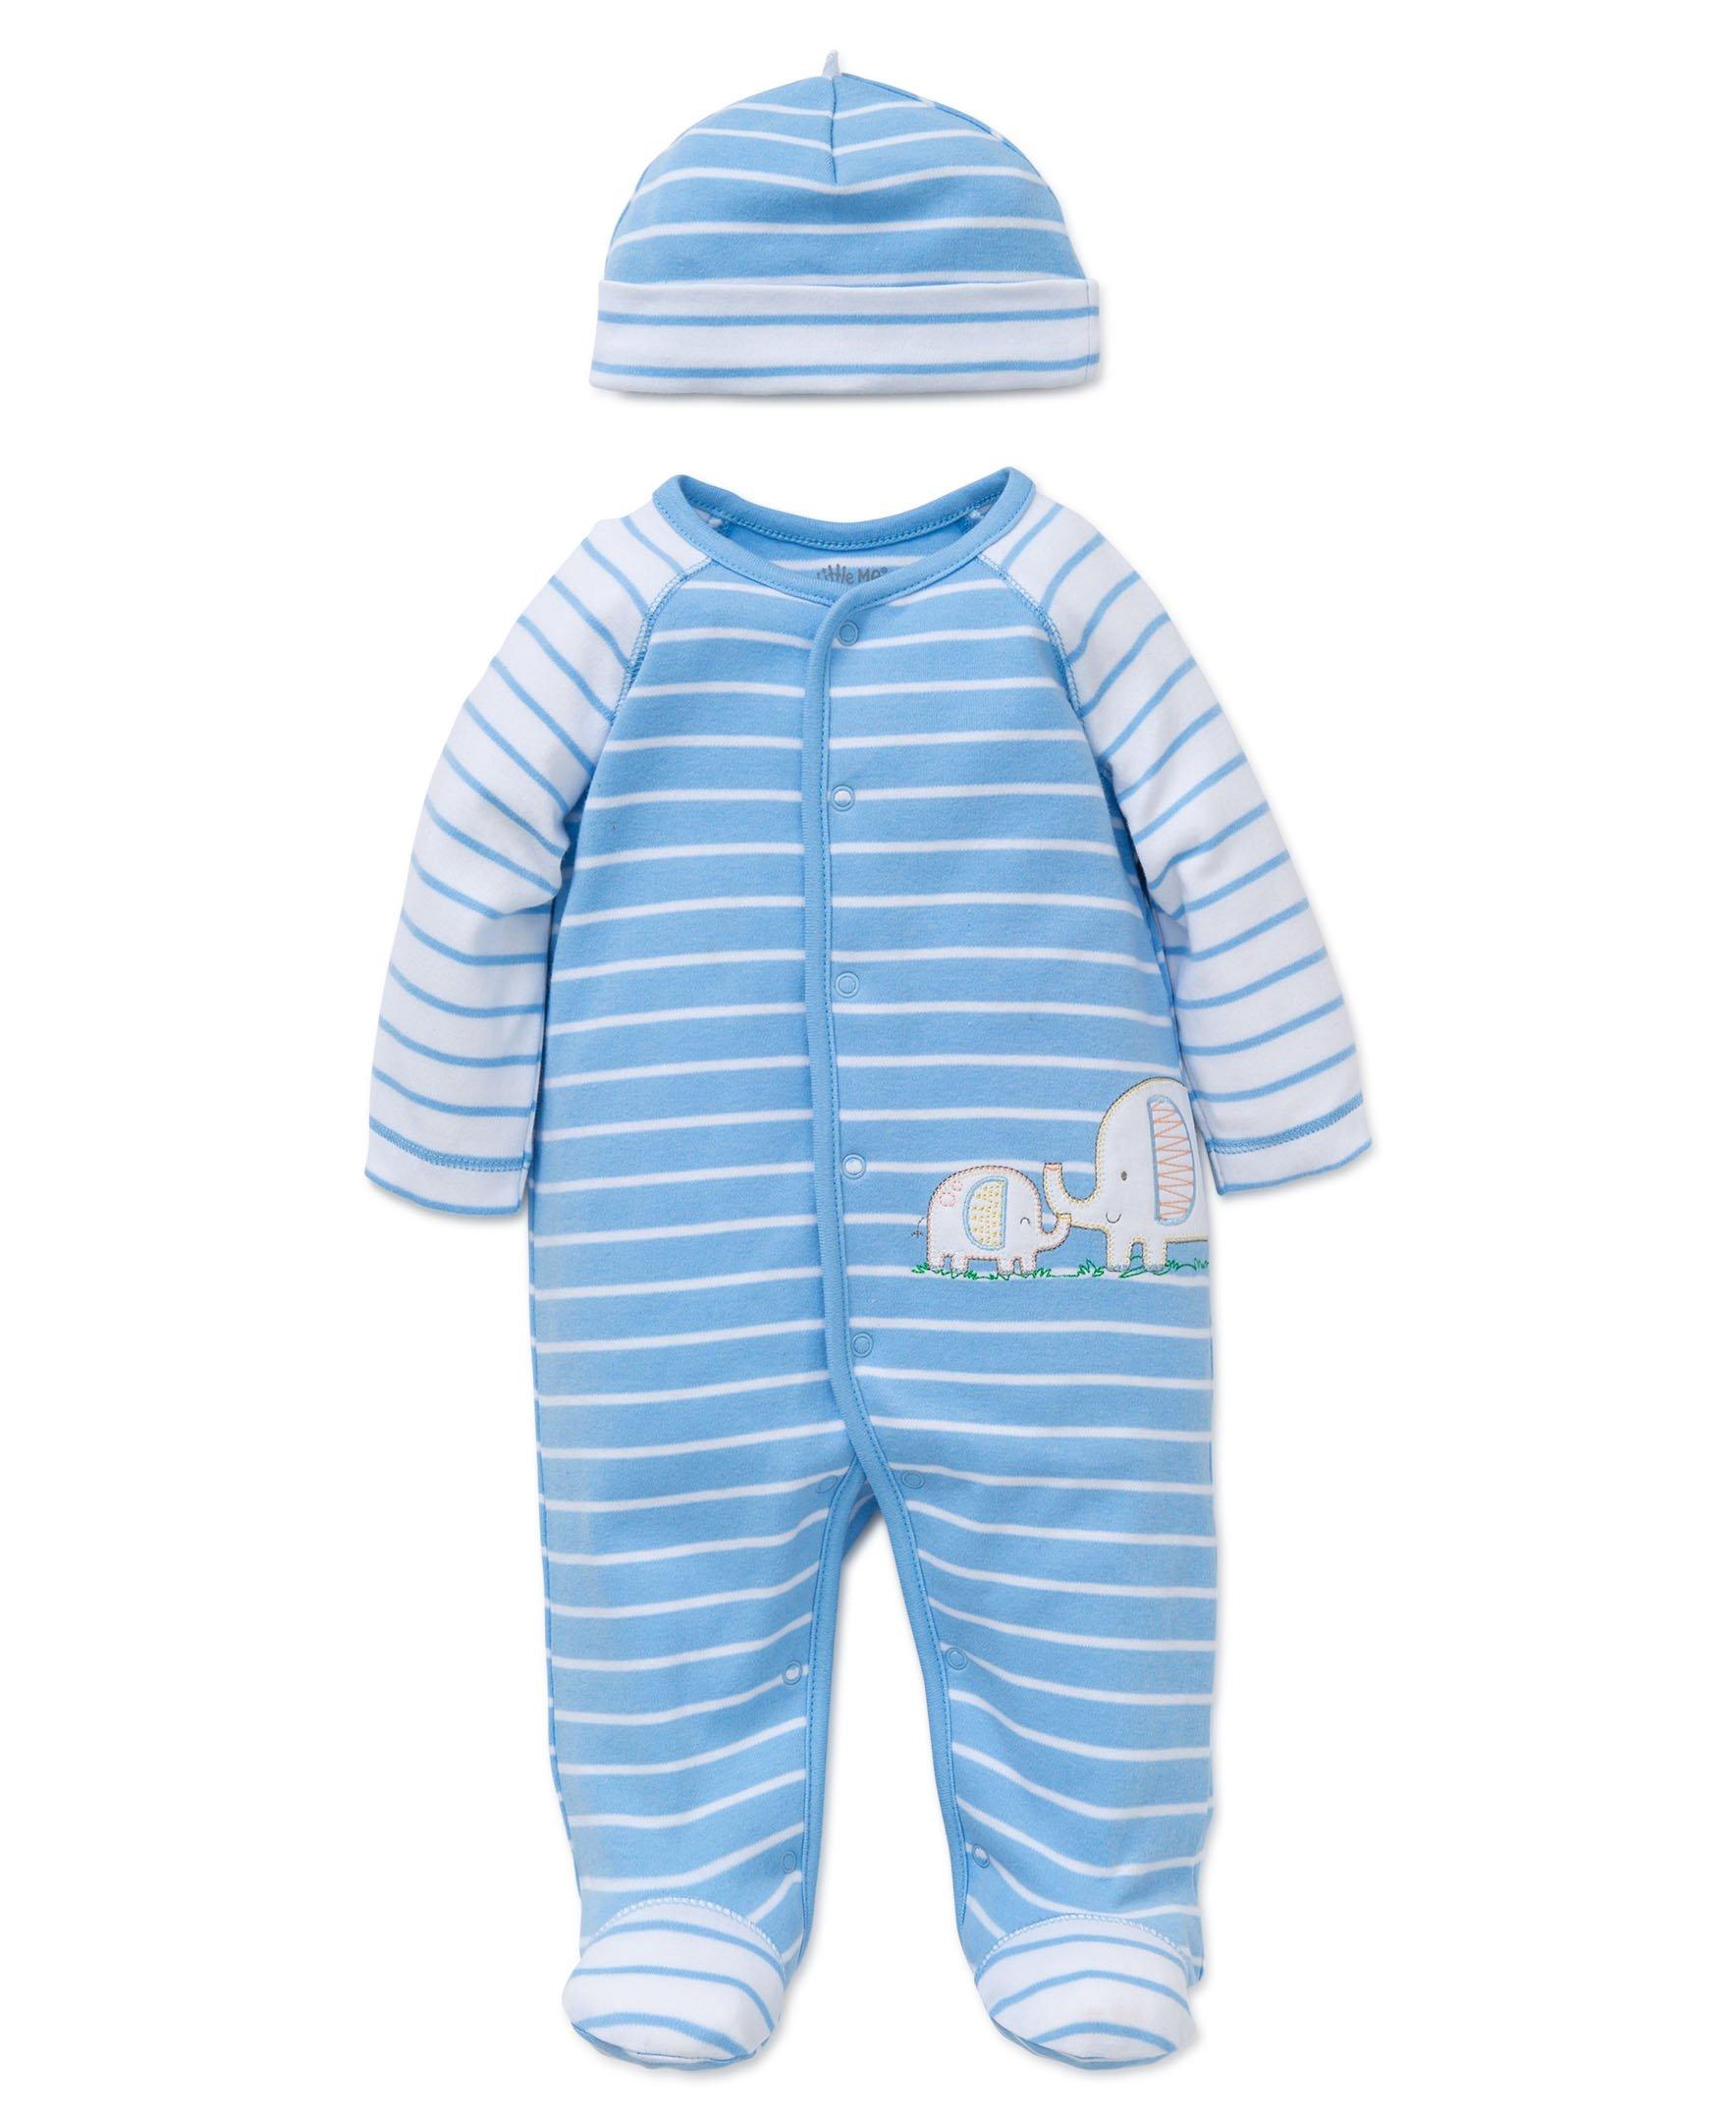 Little Me Baby Boys' Footie and Hat, Elephant, Preemie